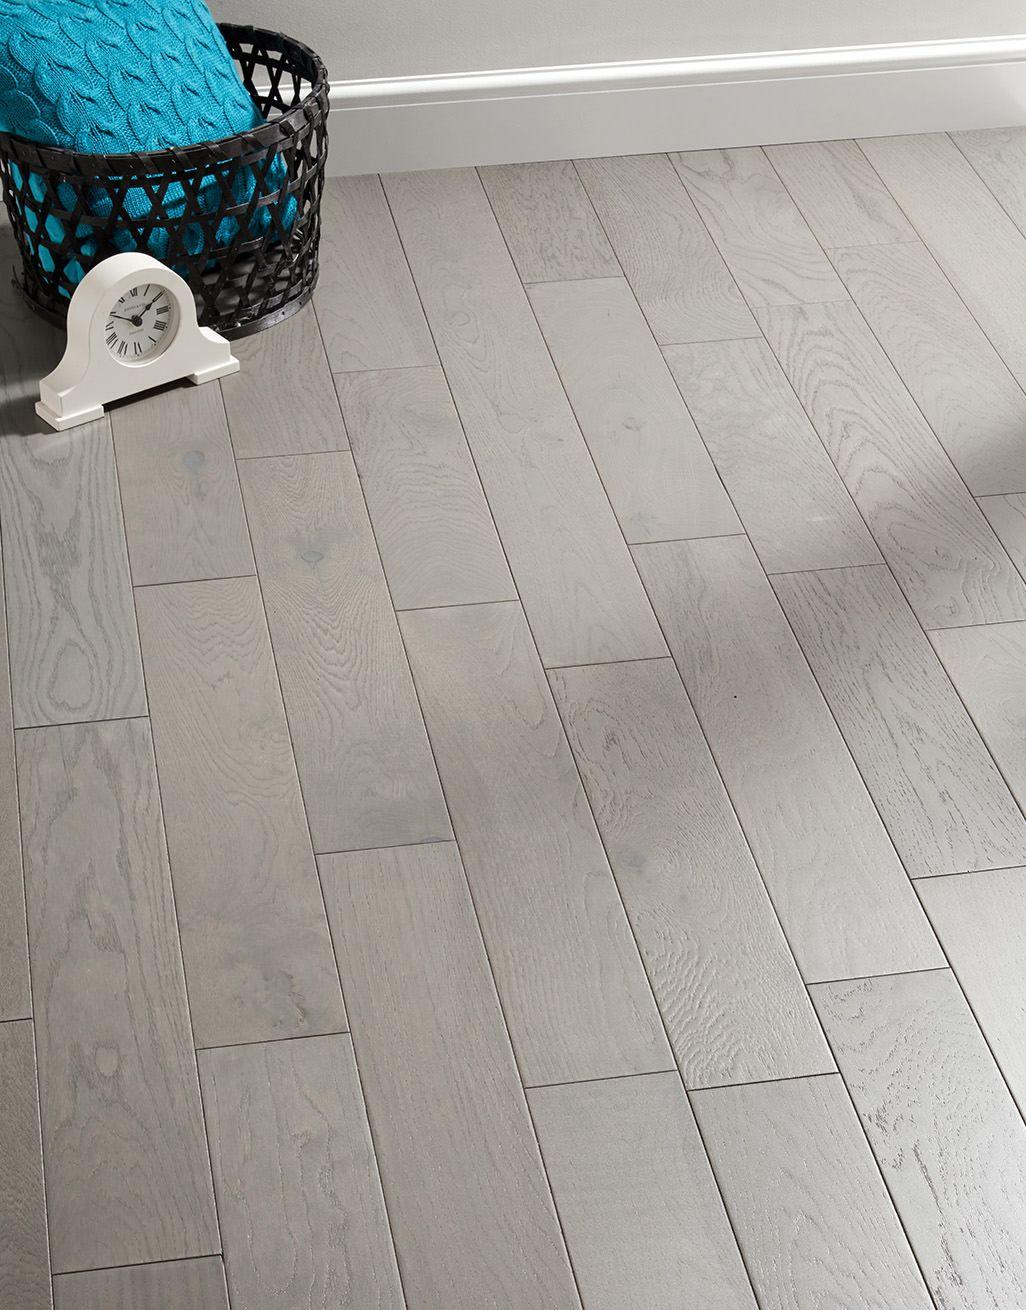 Studio Slate Grey Brushed Lacquered, Slate Colored Laminate Flooring